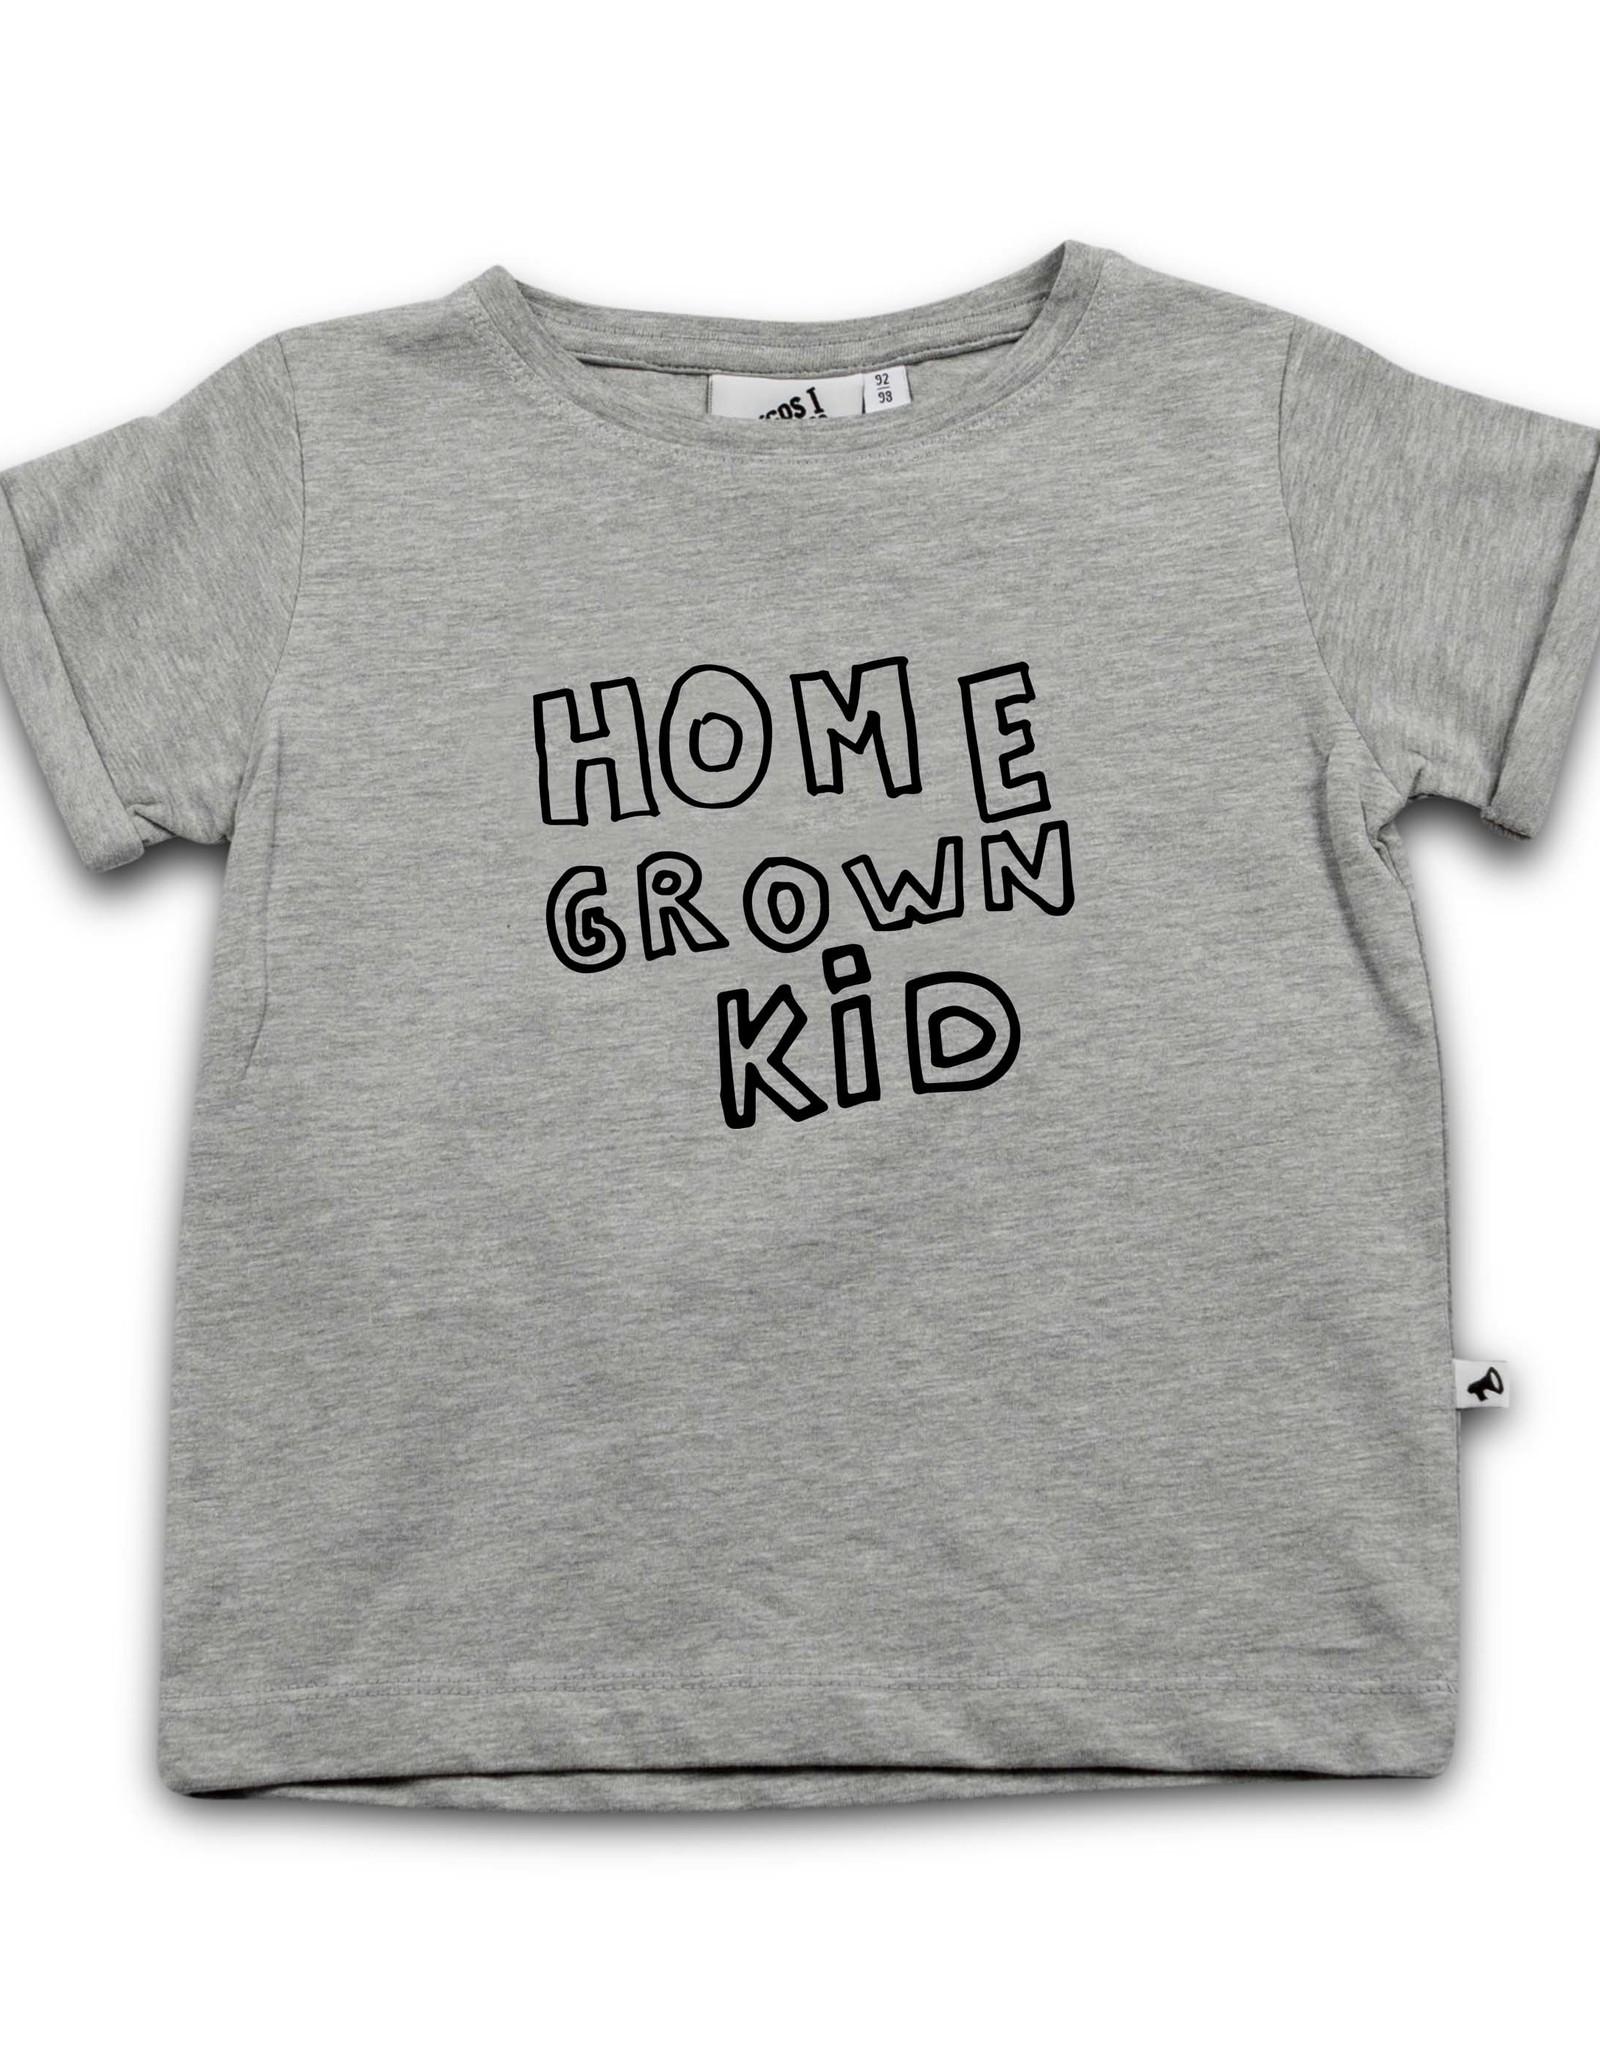 Cos i said so - Home Grown kid